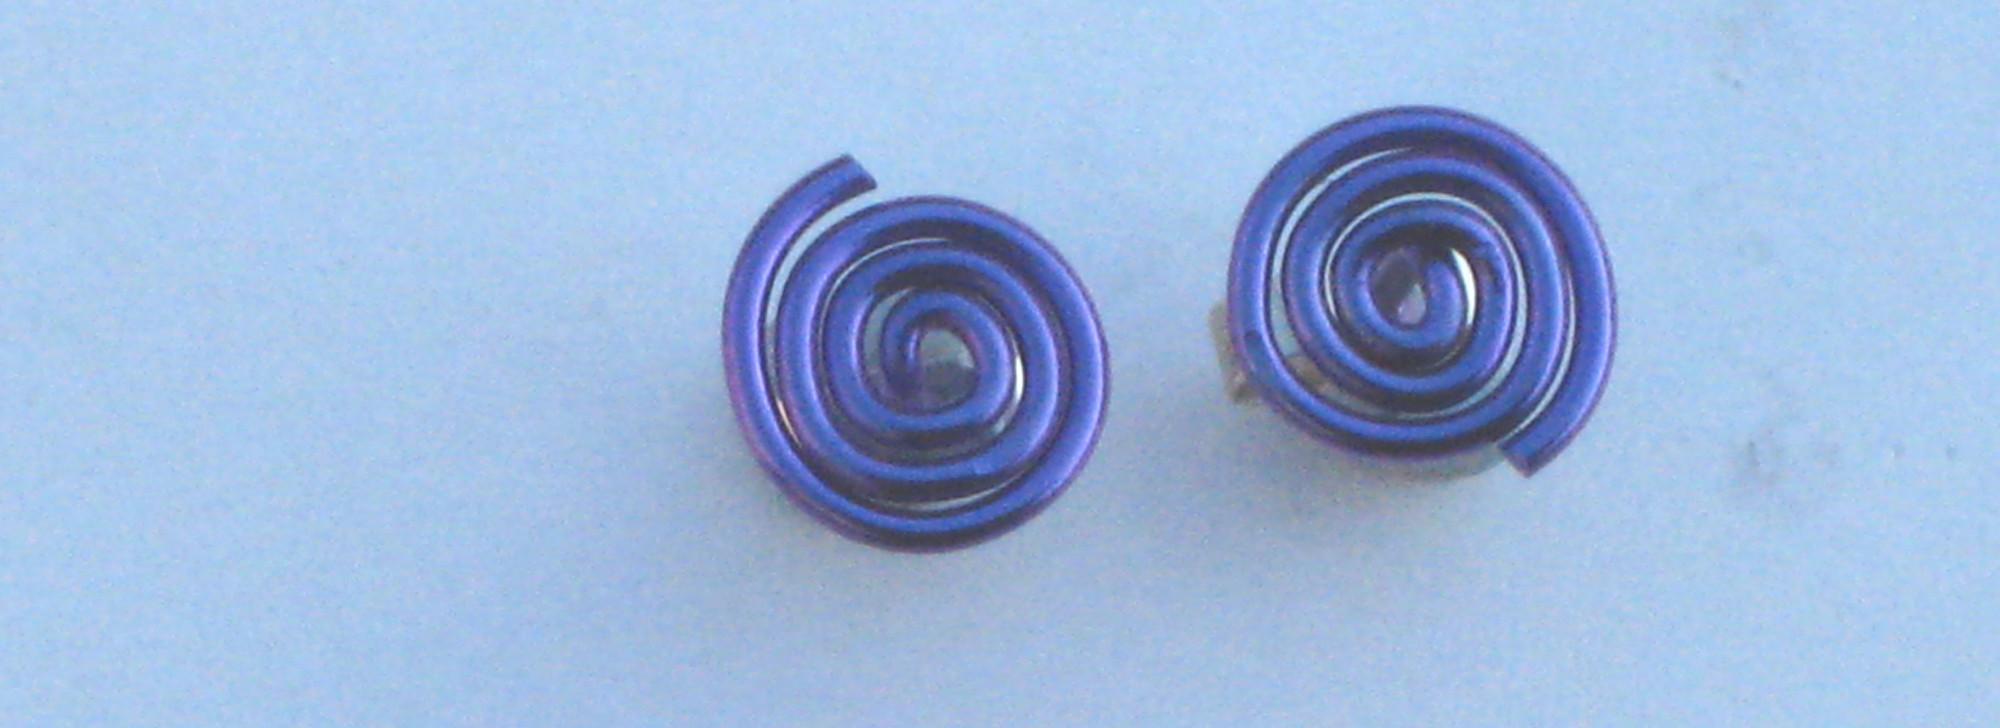 Niobium Spiral Studs Purple  £10.00